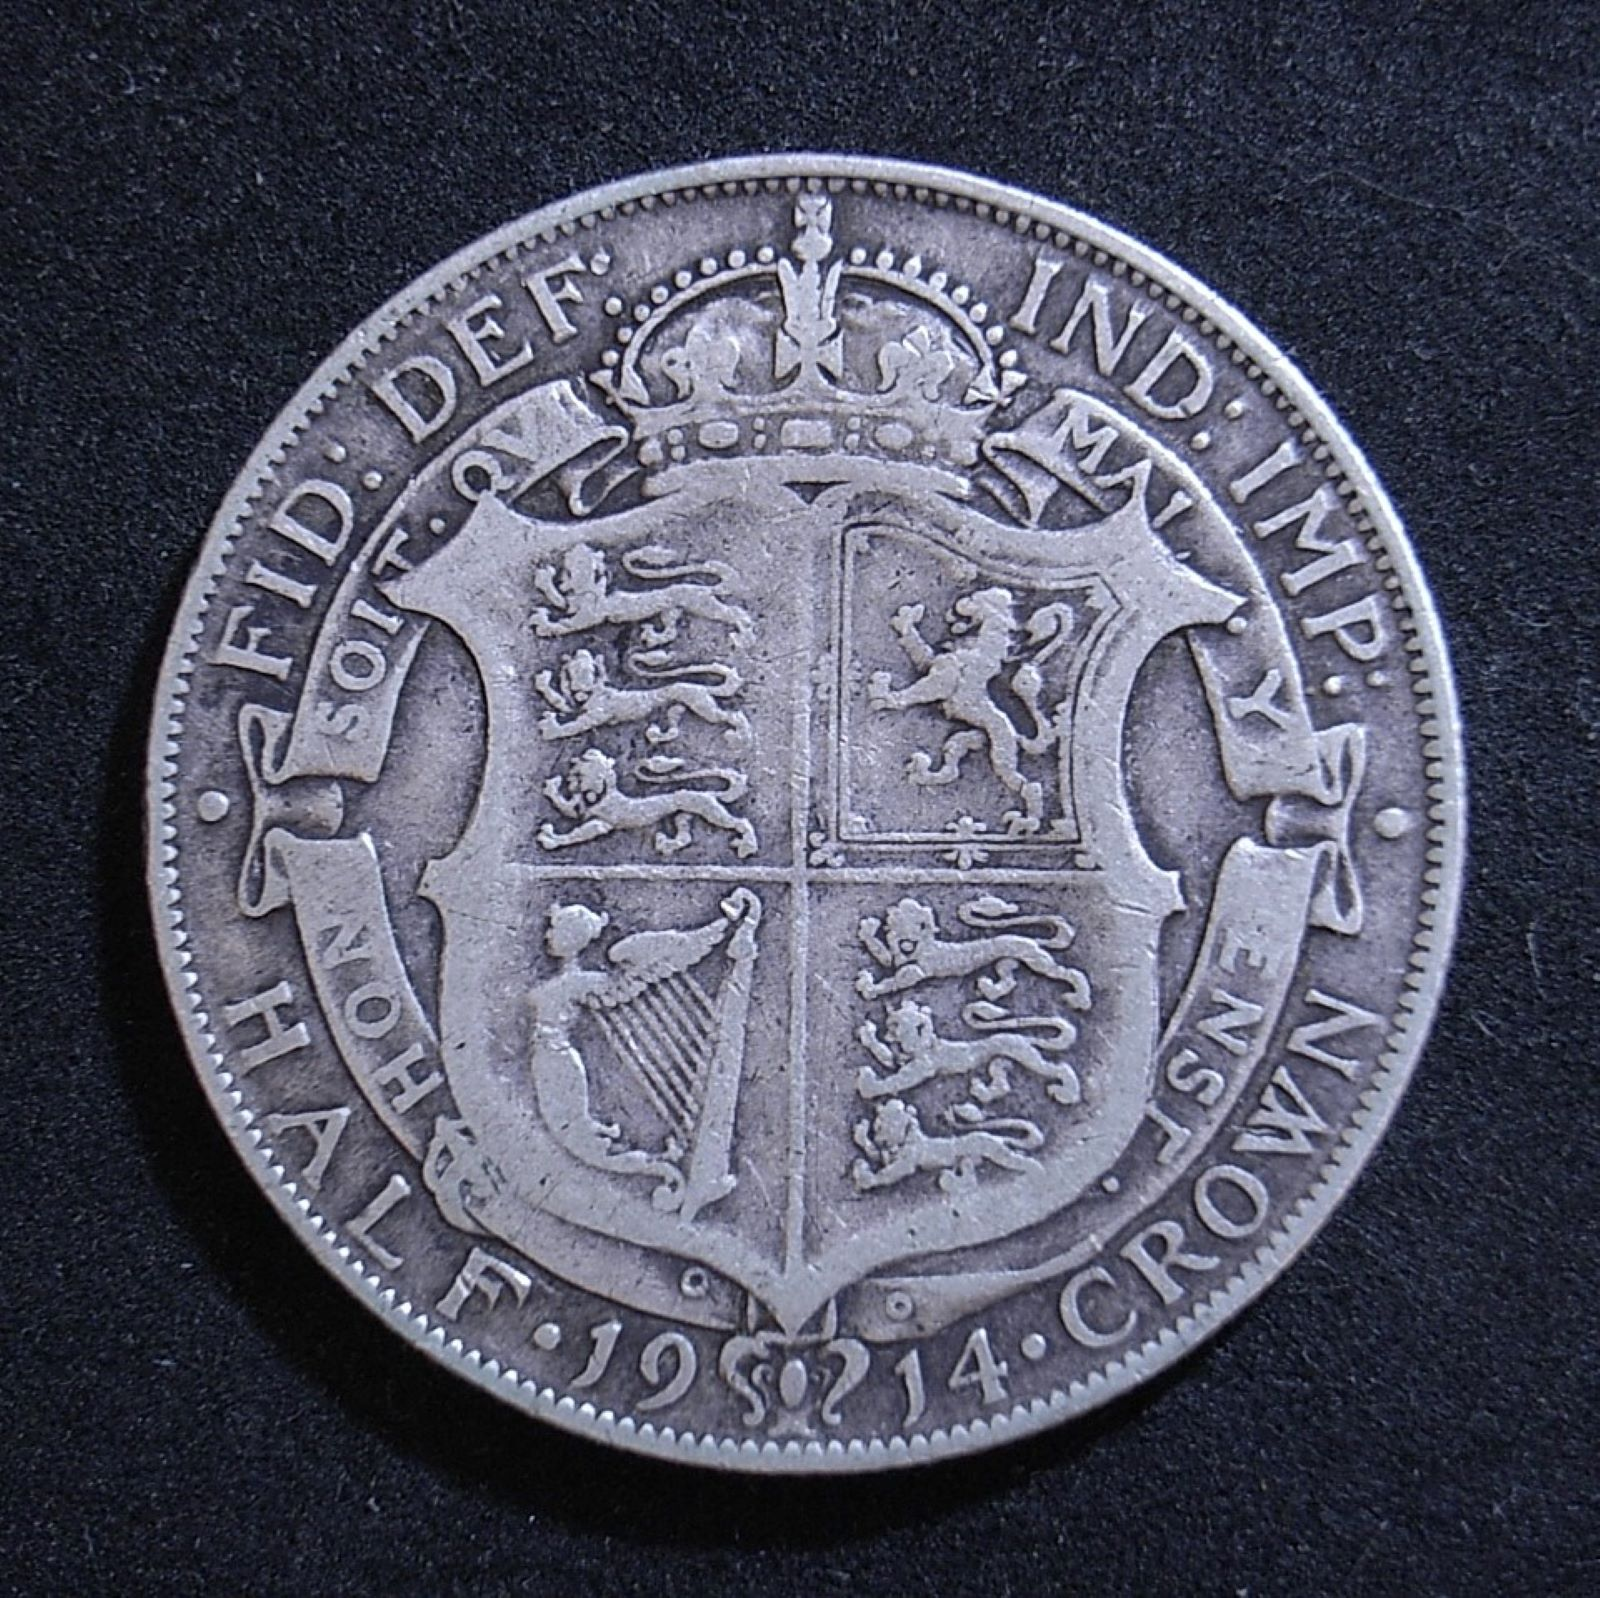 UK Half Crown 1914 rev 1